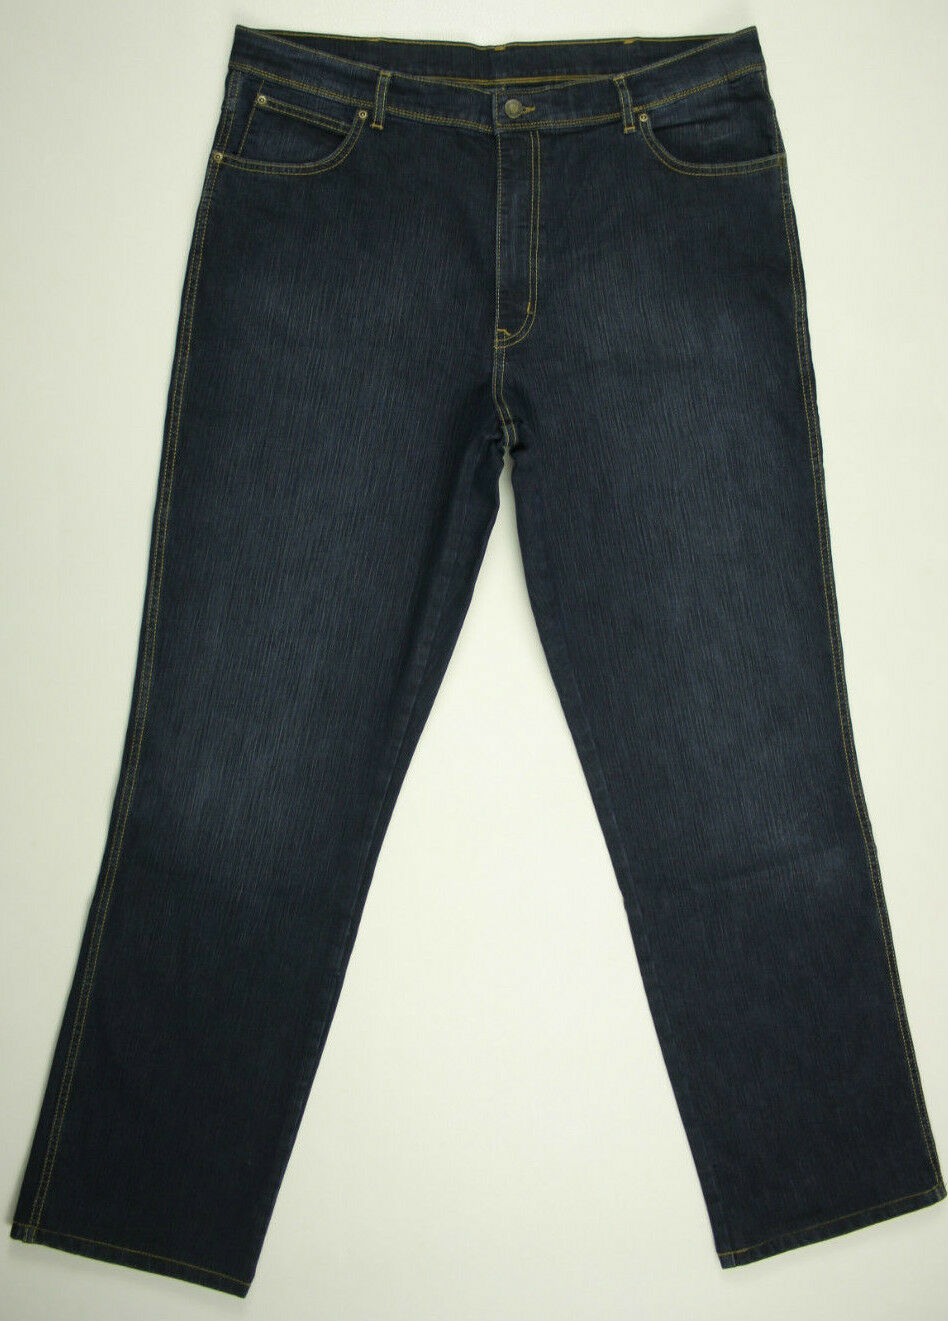 Wrangler Jeans 'REGULAR FIT DARK USED' Indigo W40 L32 EUC AS NEW RRP  Mens